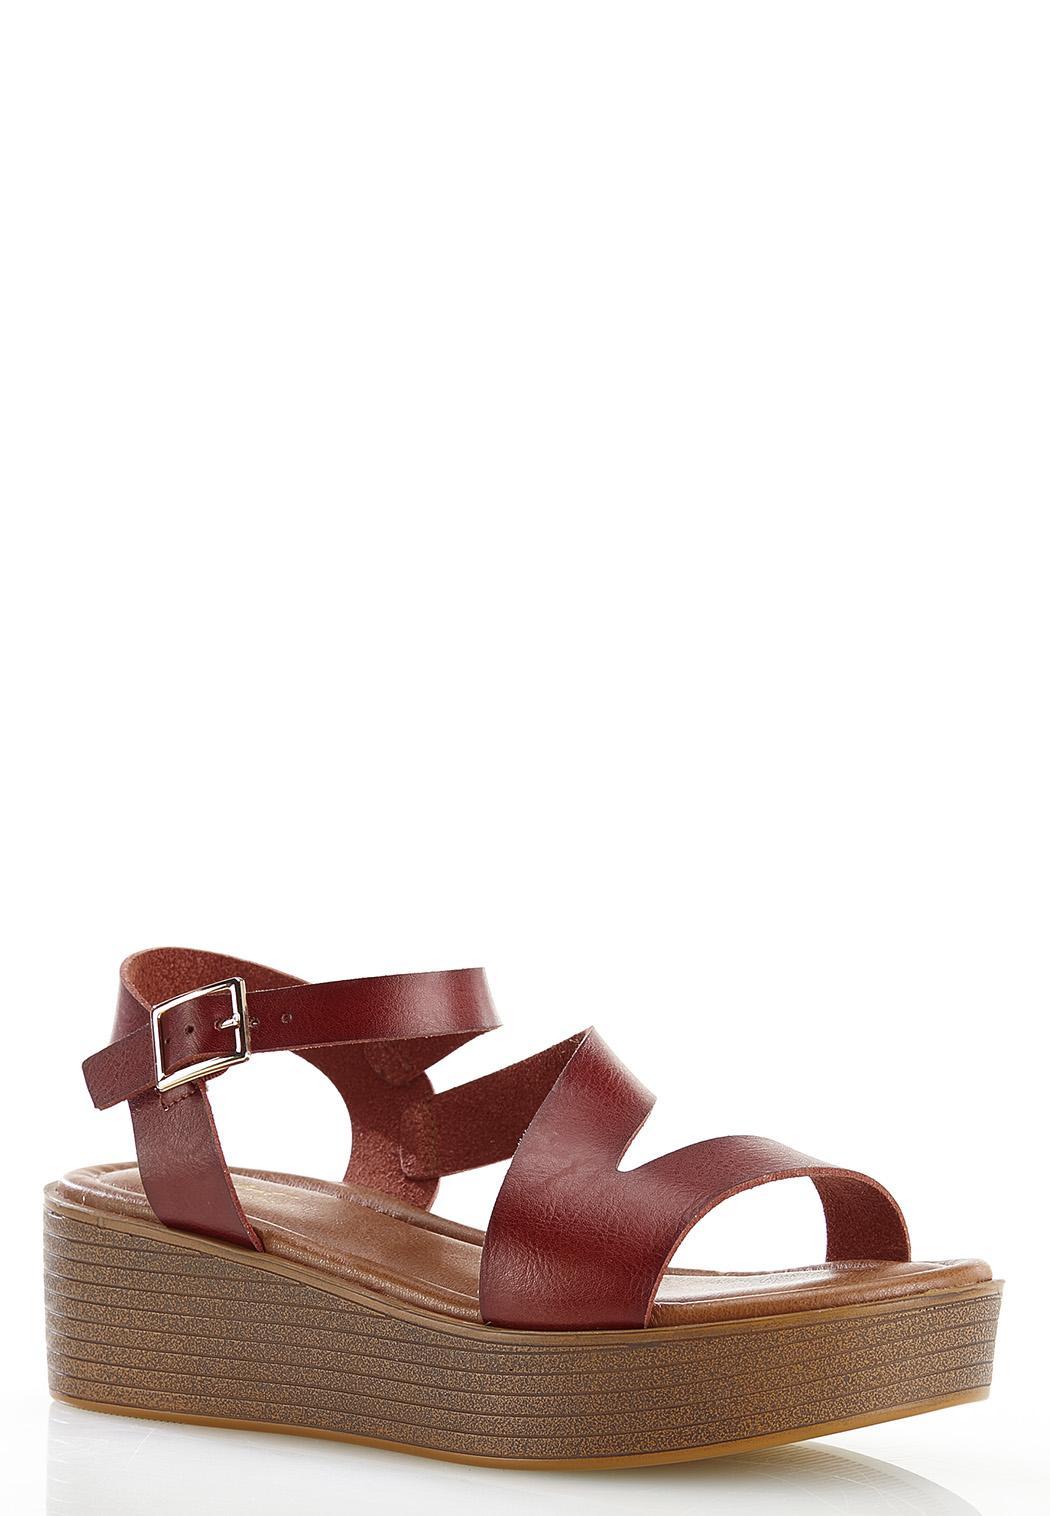 Asymmetrical Flatform Wedge Sandals